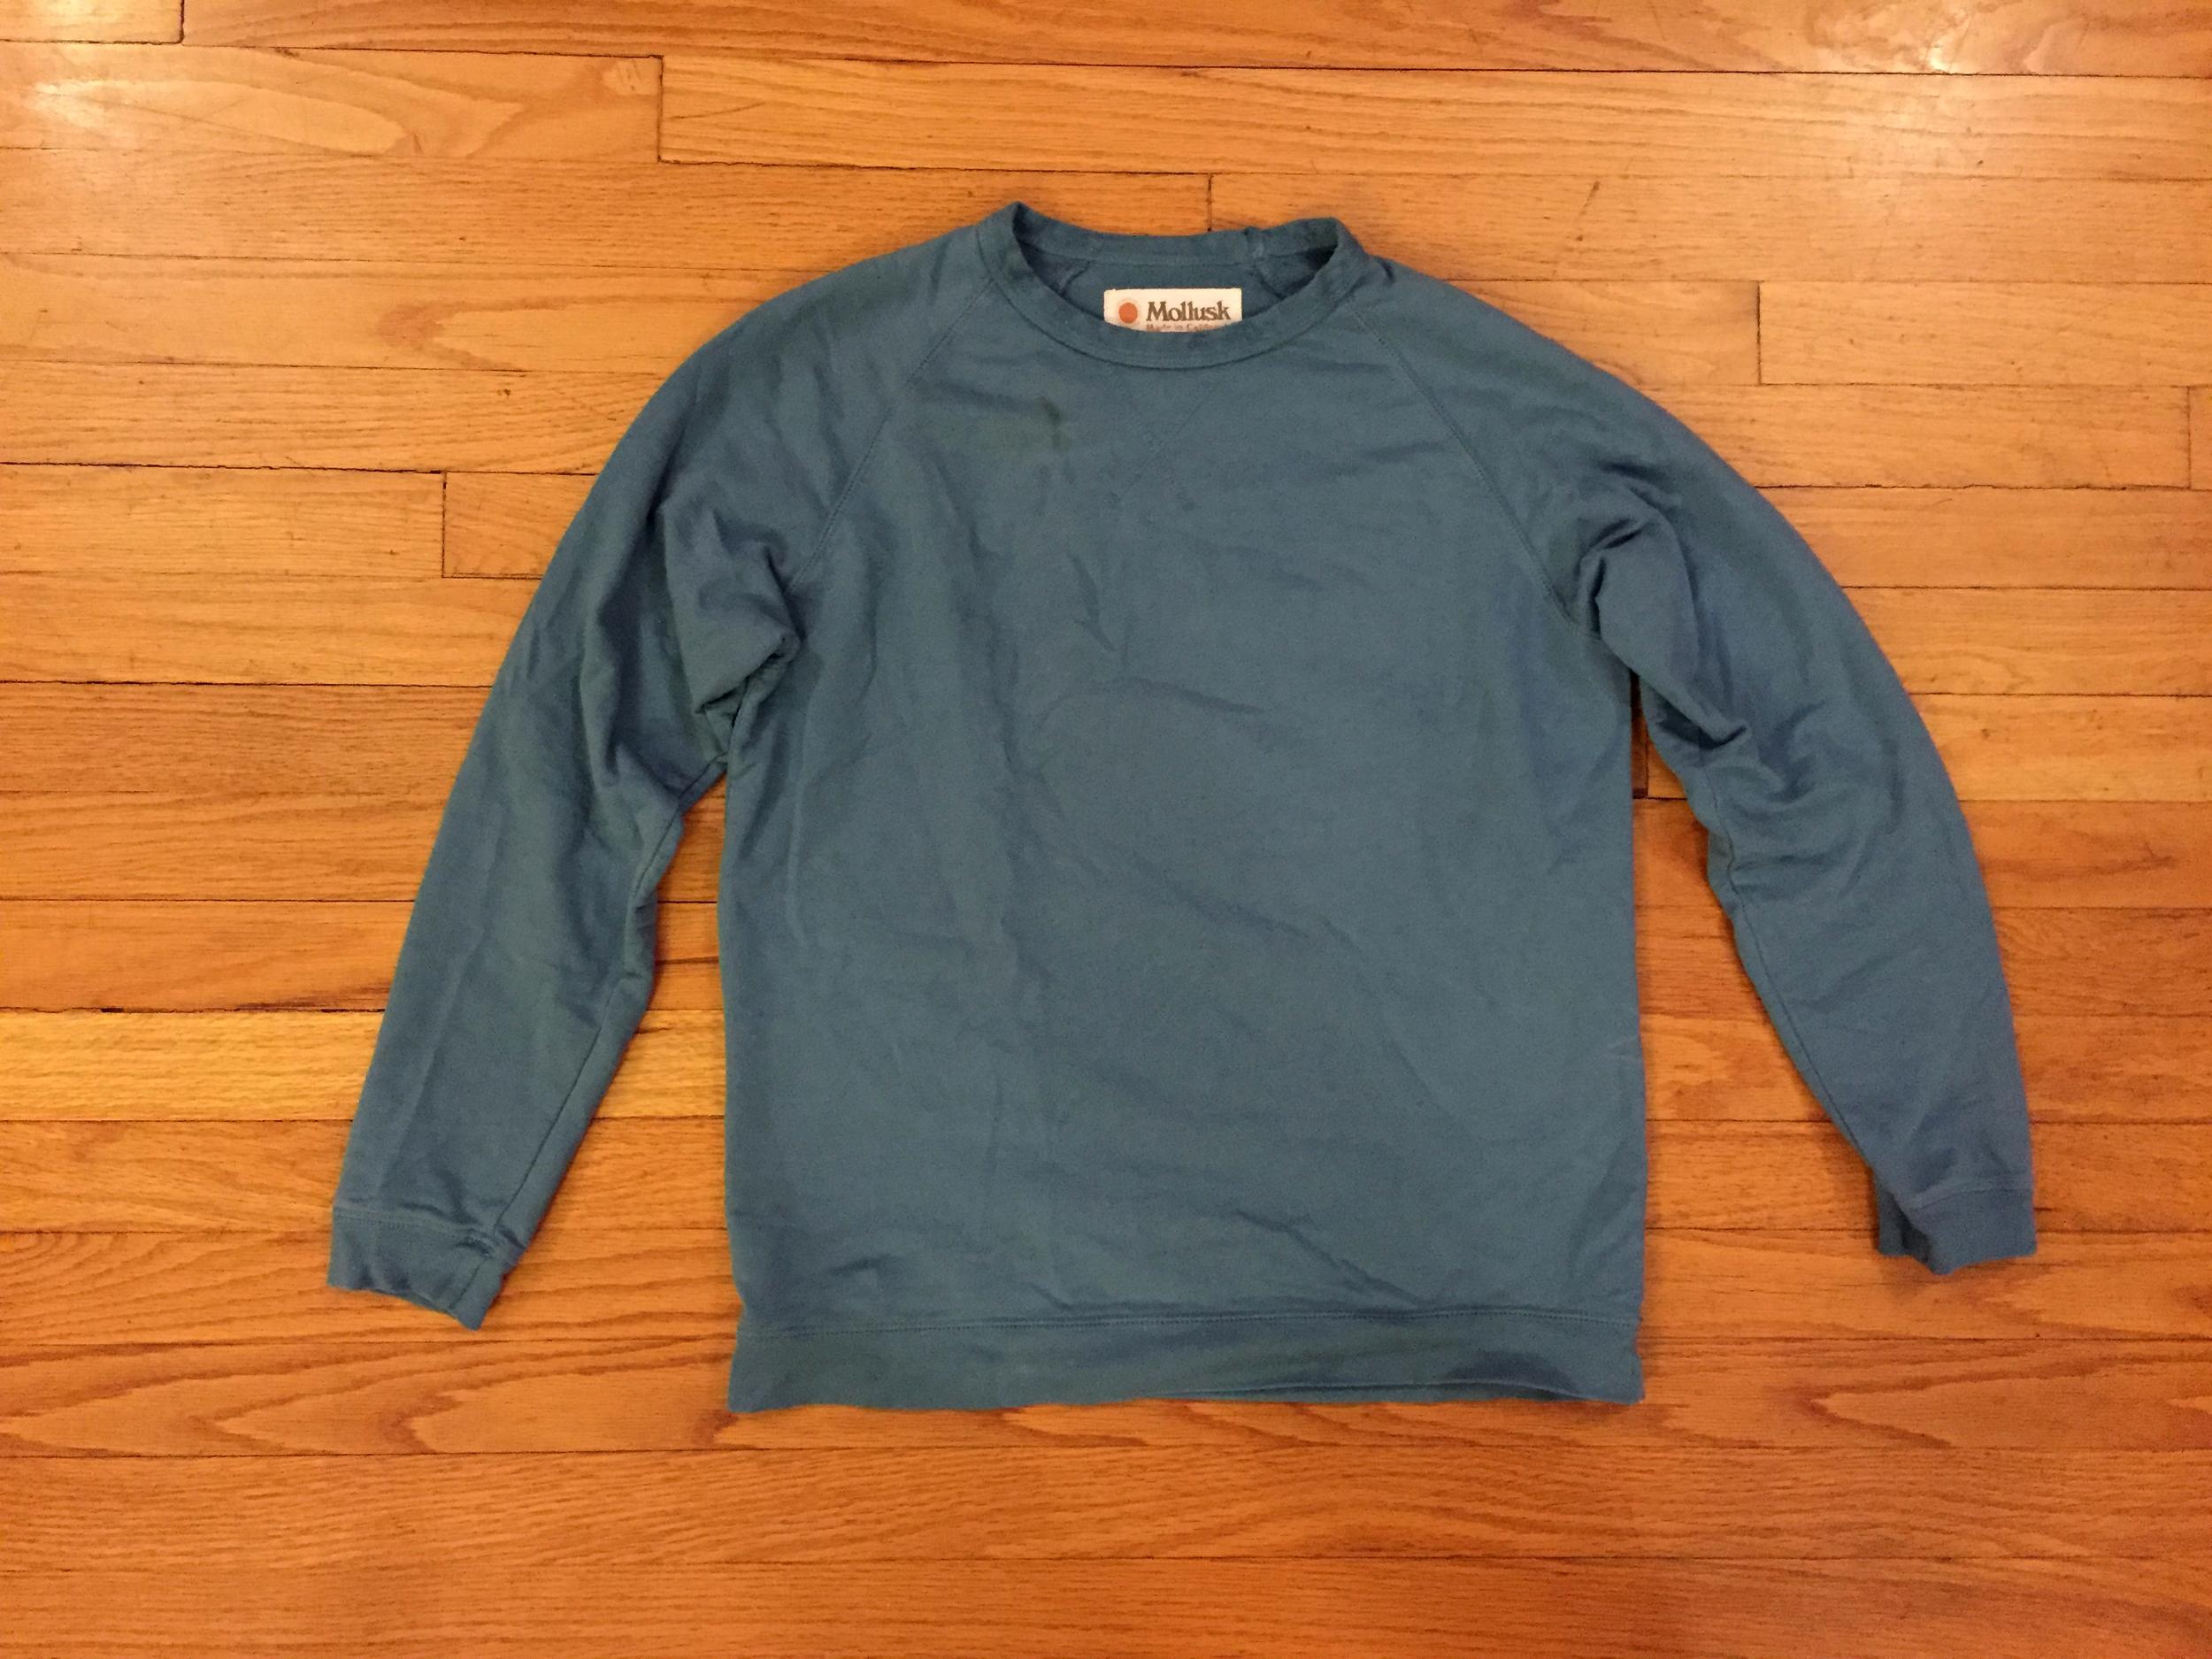 Mollusk Sweatshirt